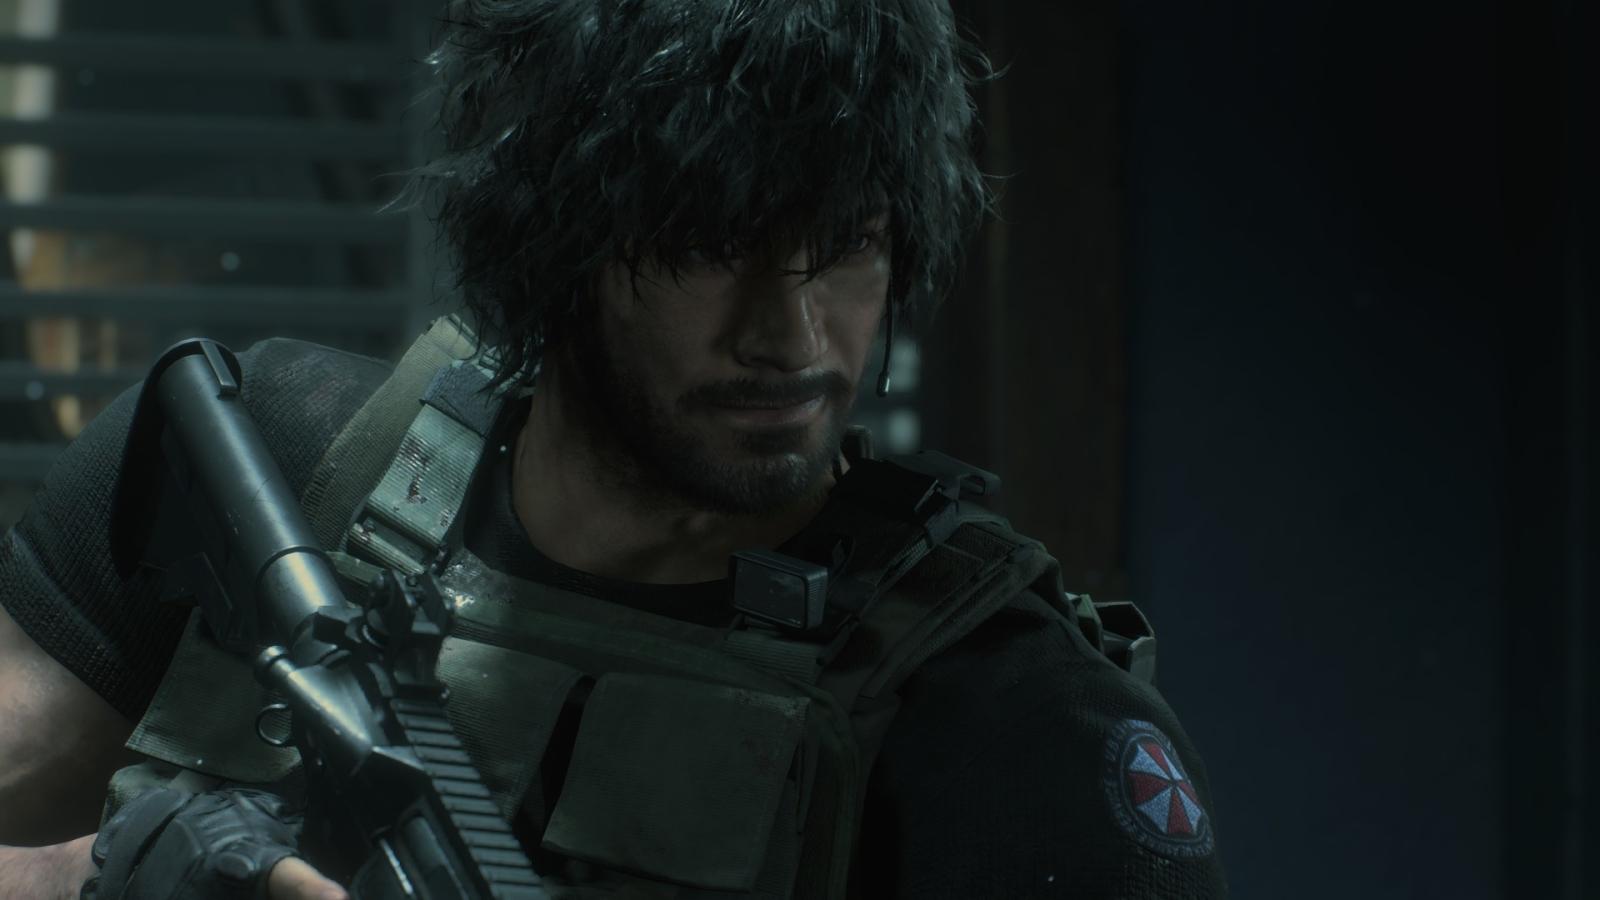 1600x900 Carlos Resident Evil 3 Remake 1600x900 Resolution